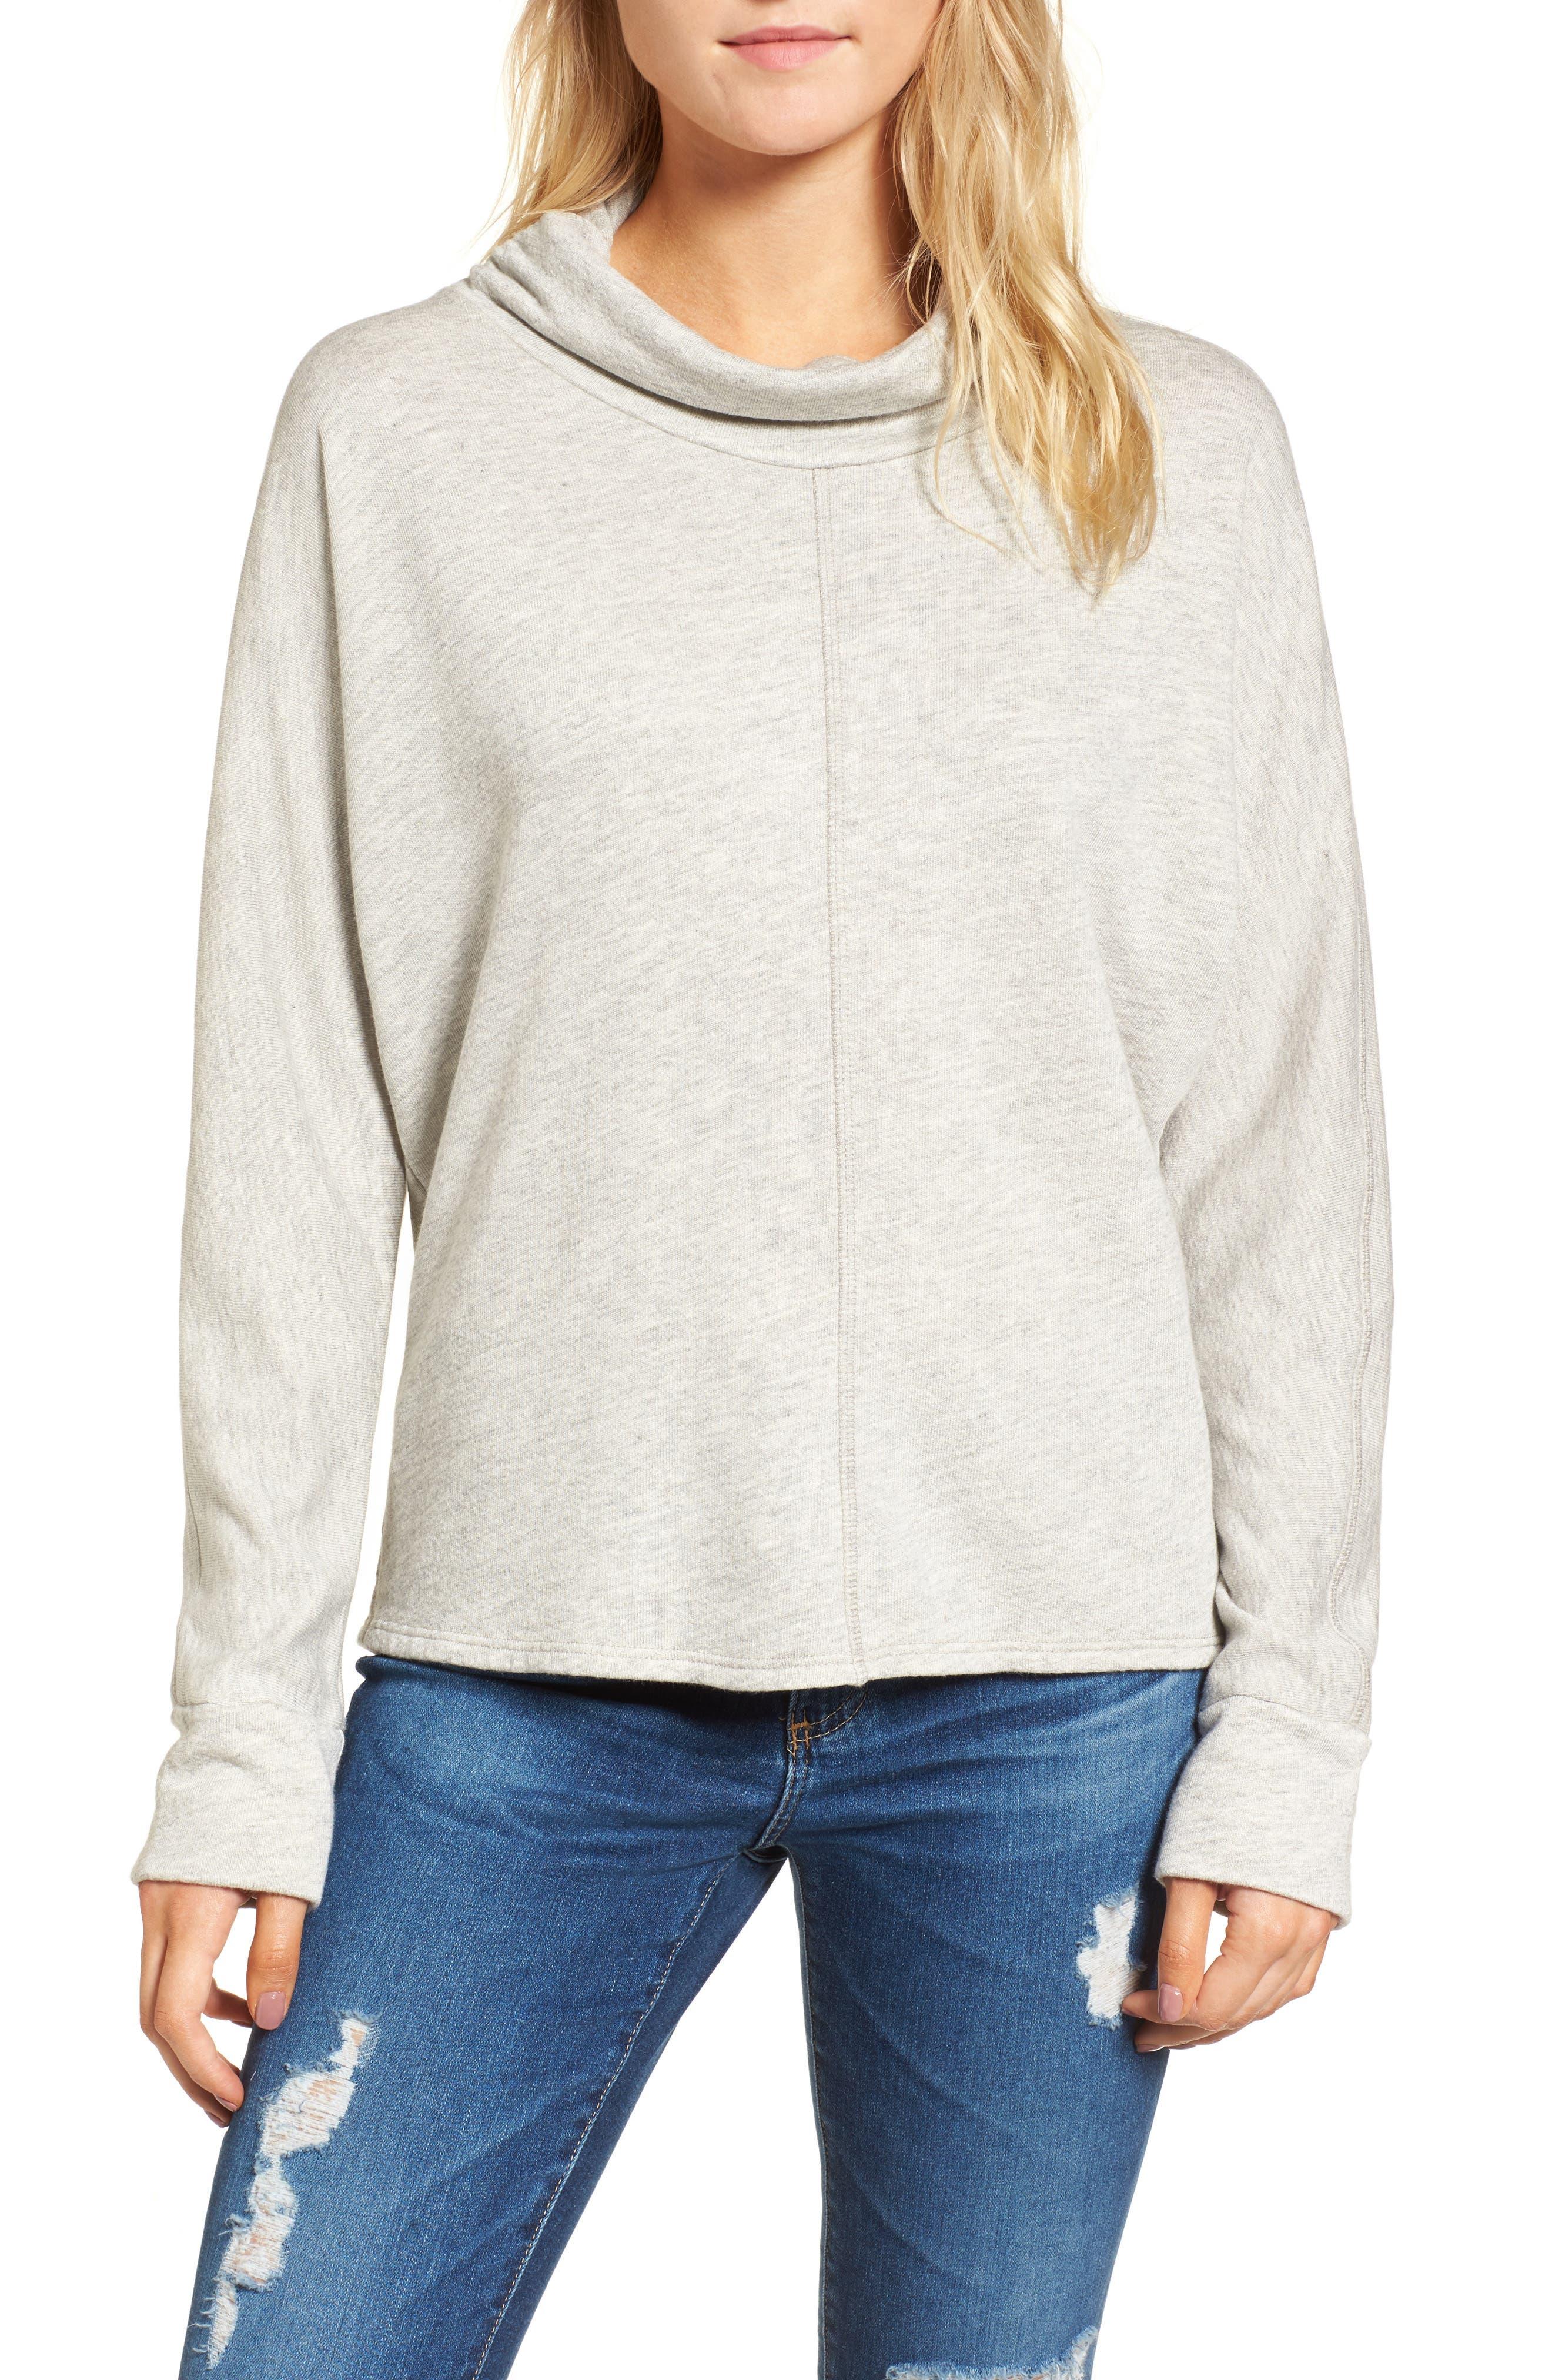 Helix Turtleneck Sweatshirt,                             Main thumbnail 1, color,                             030